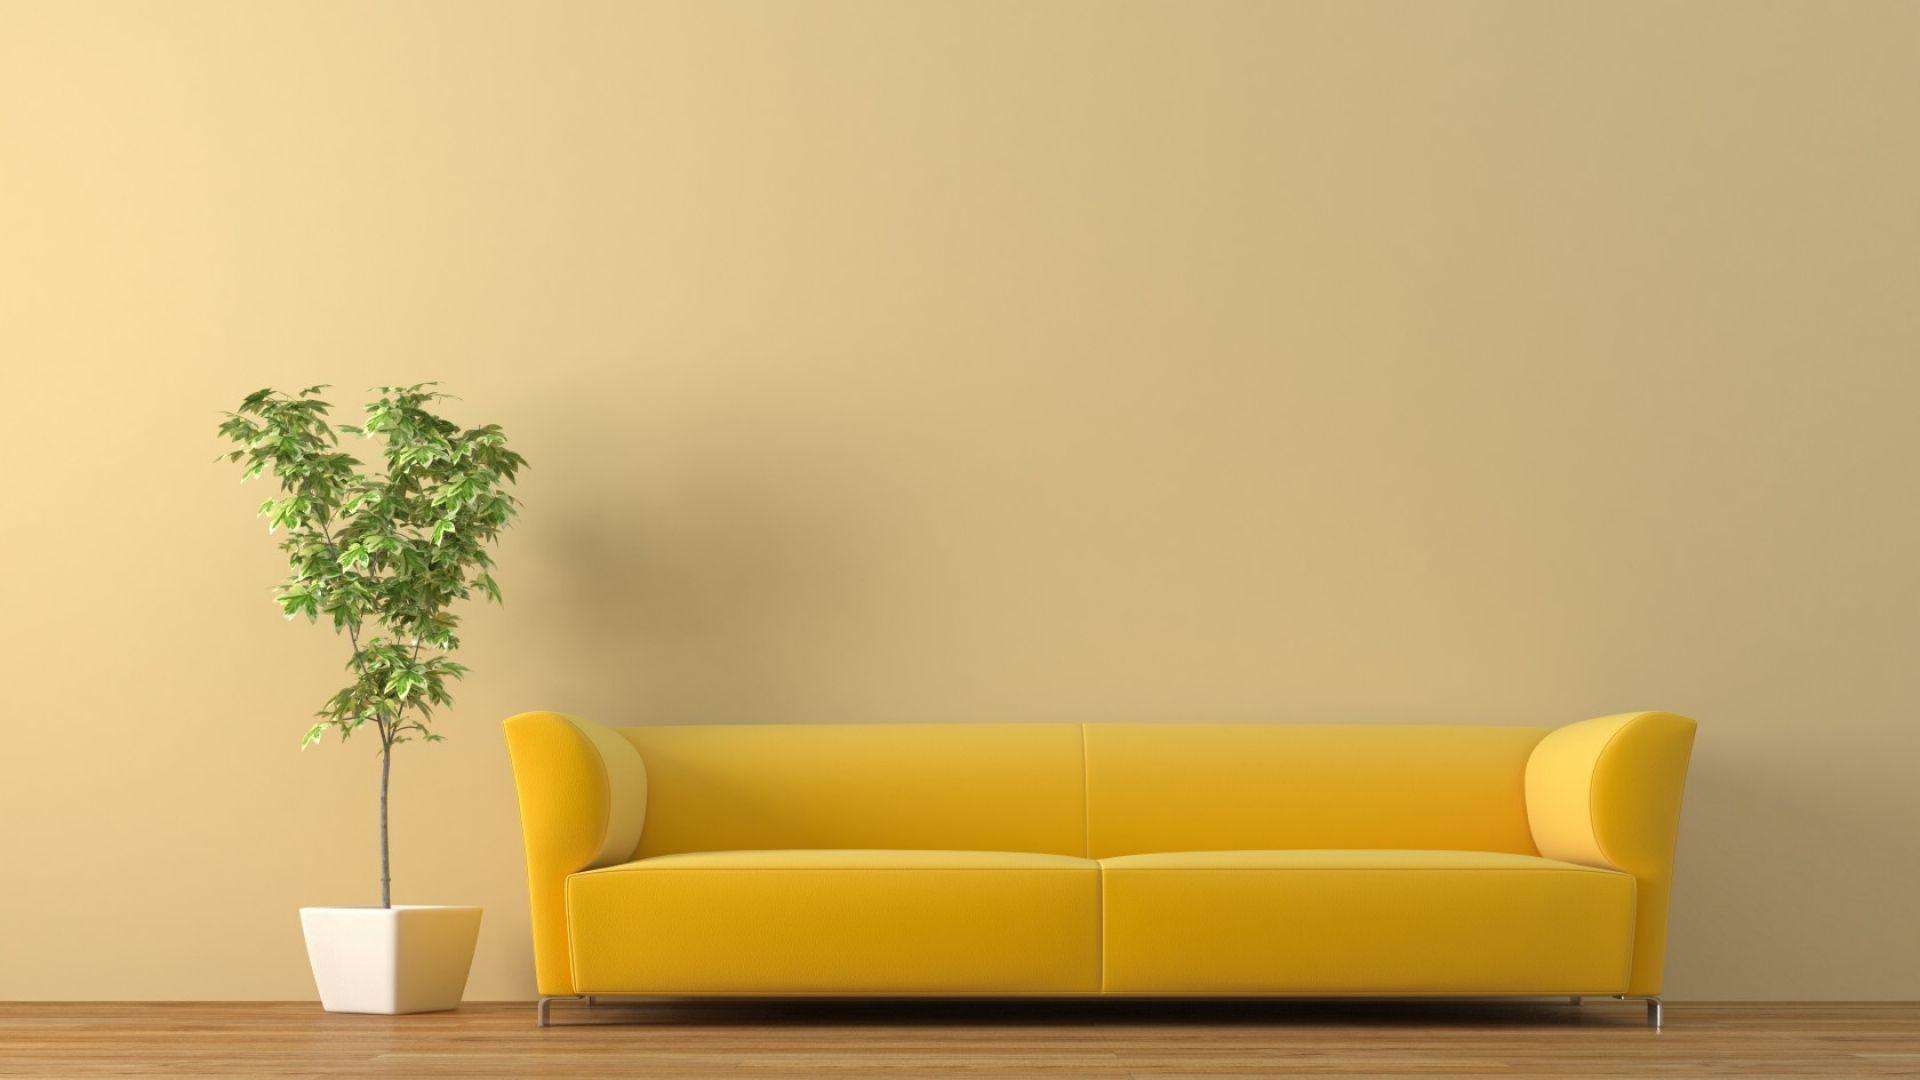 Sofa Wallpapers Wallpaper Cave